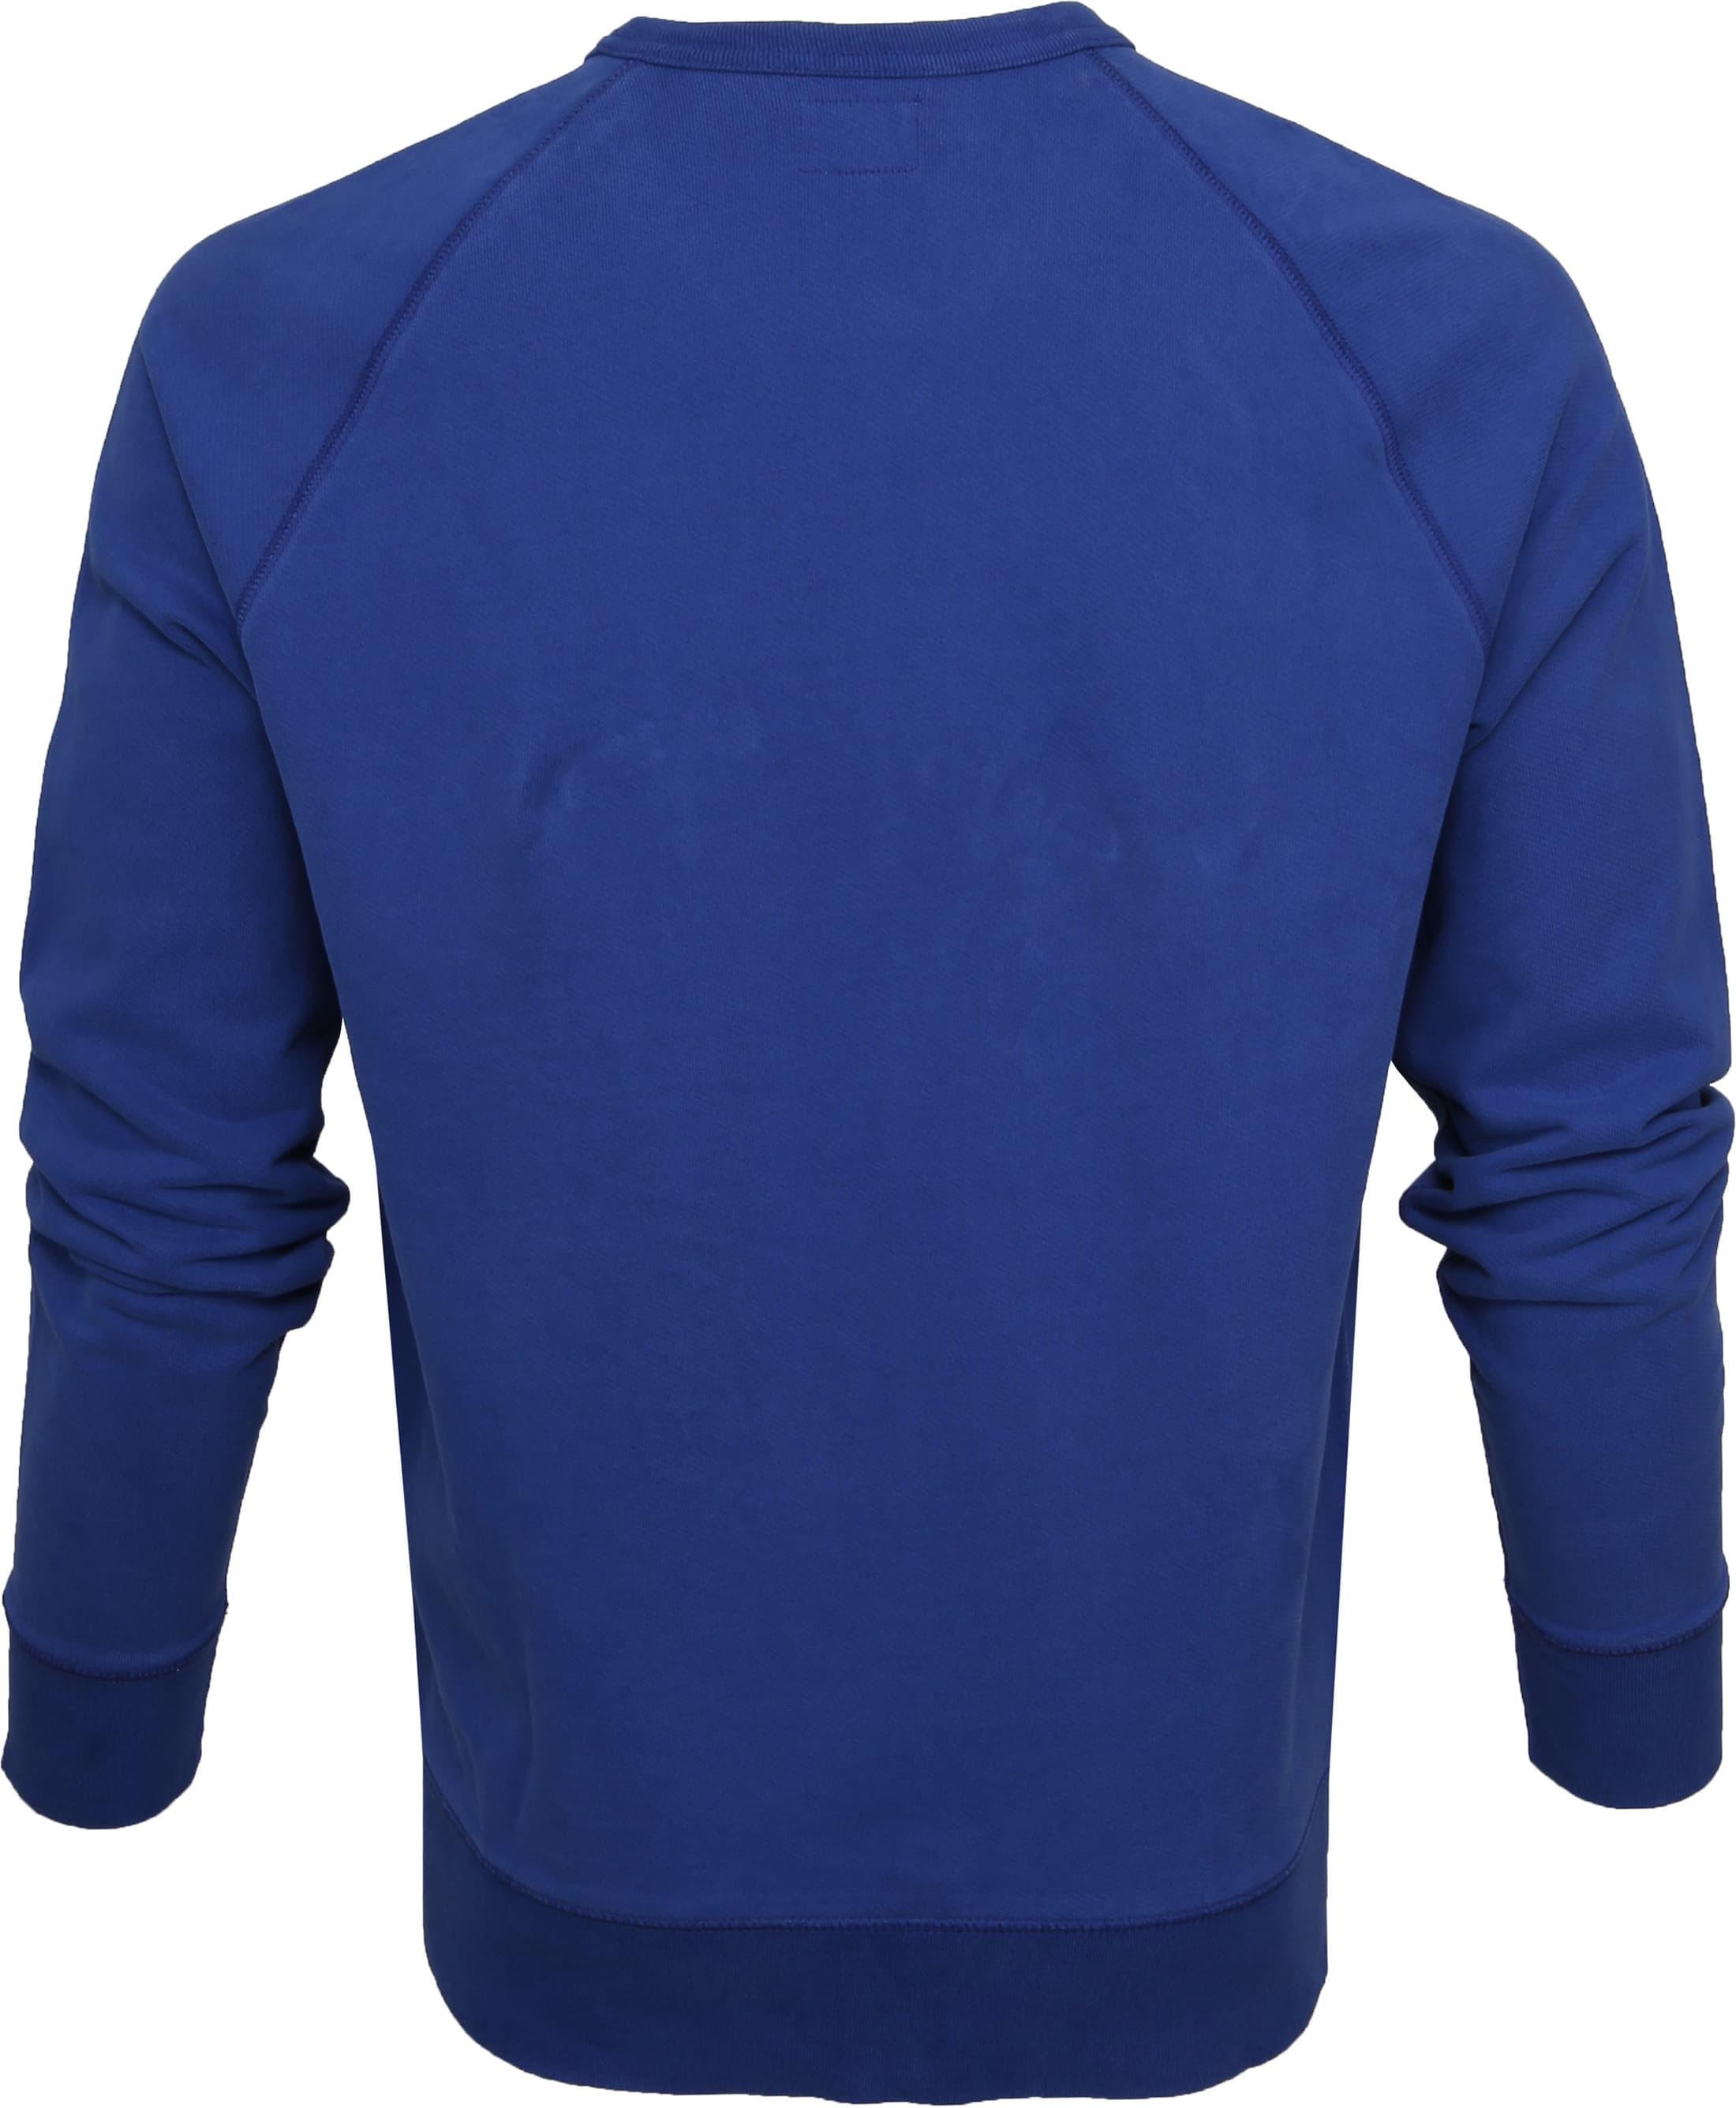 Levi's Original Sweater Indigo Blue photo 3